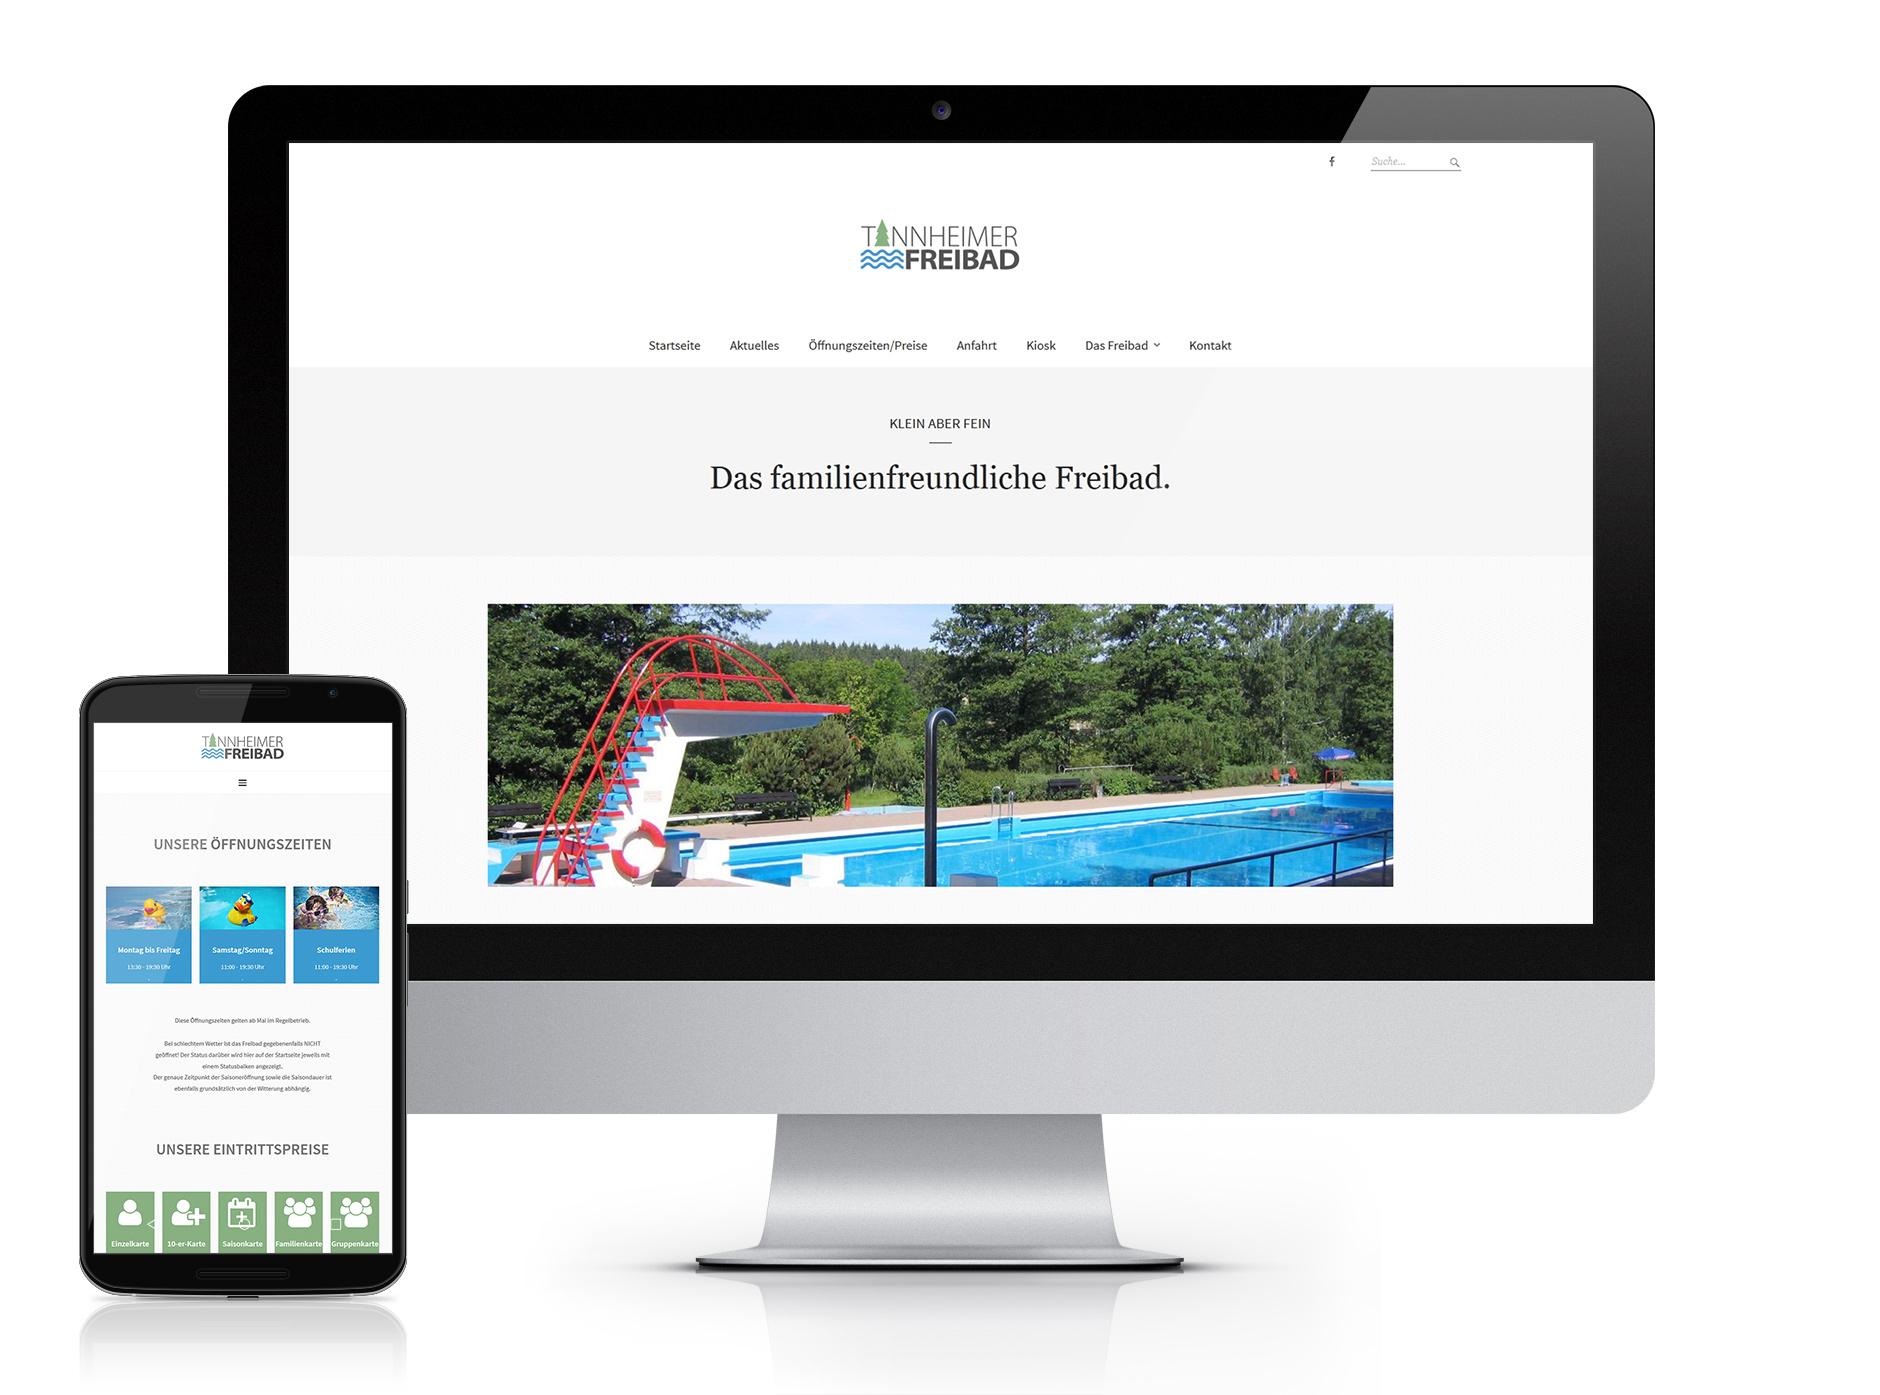 WEB Tannheimer Freibad screen-Webdesign Tannheimer Freibad